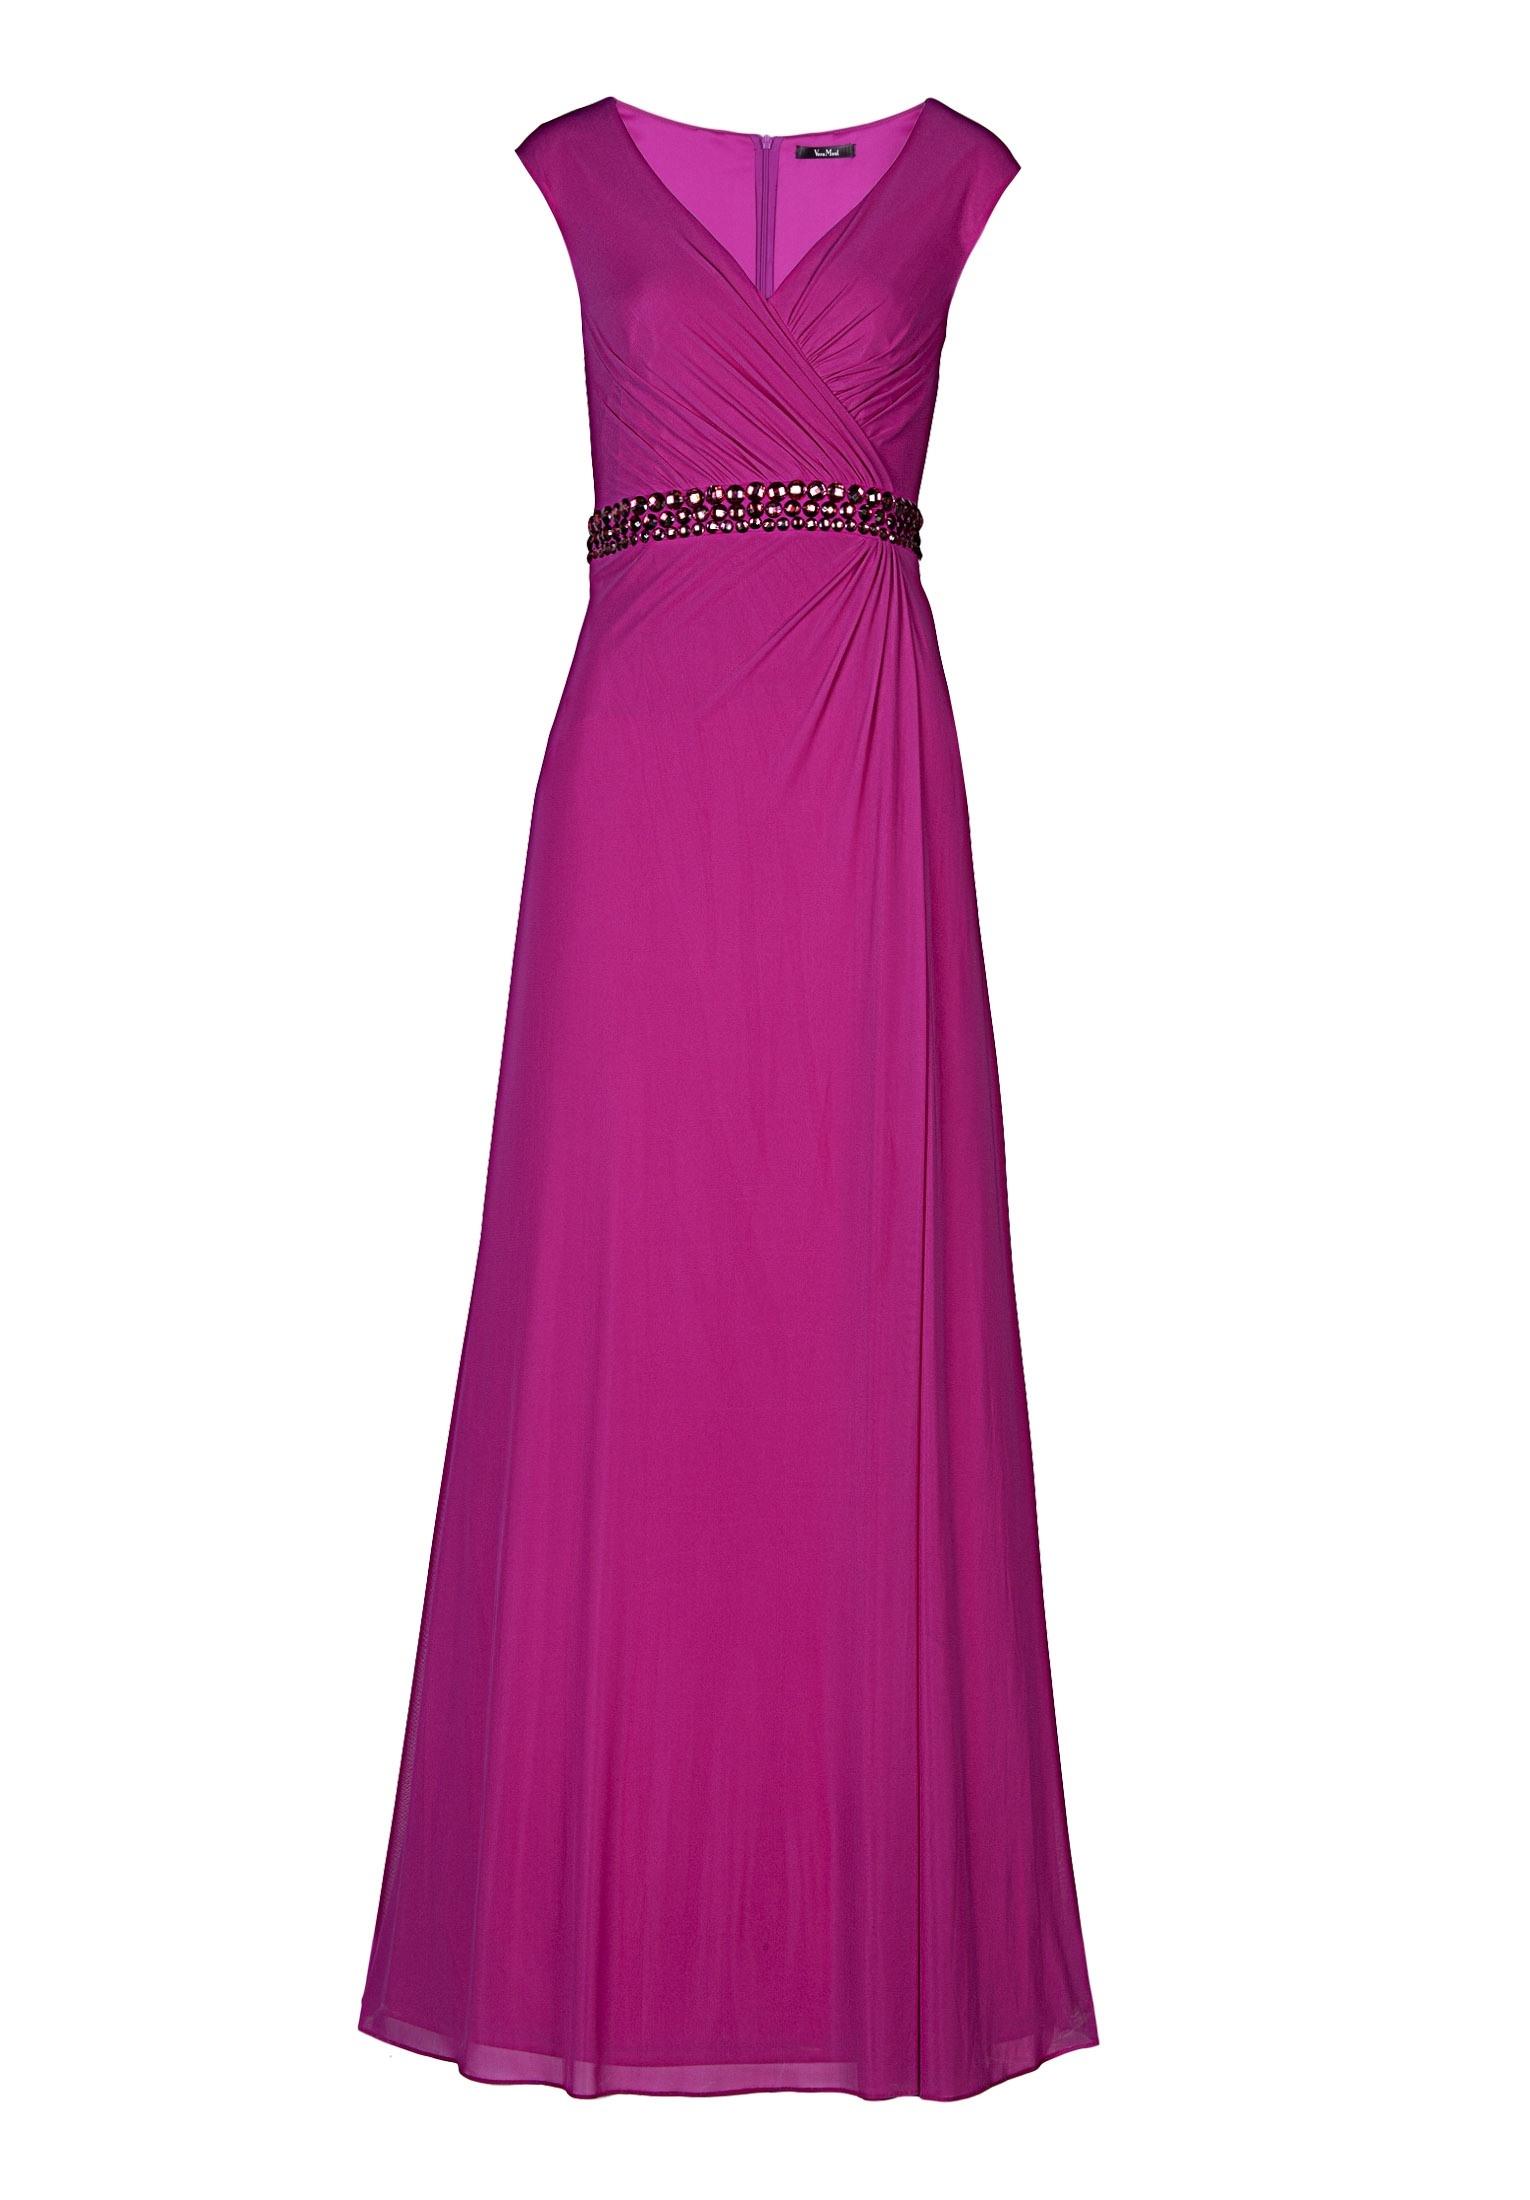 20 Einzigartig Abendkleid Pink Lang Spezialgebiet17 Luxus Abendkleid Pink Lang Design